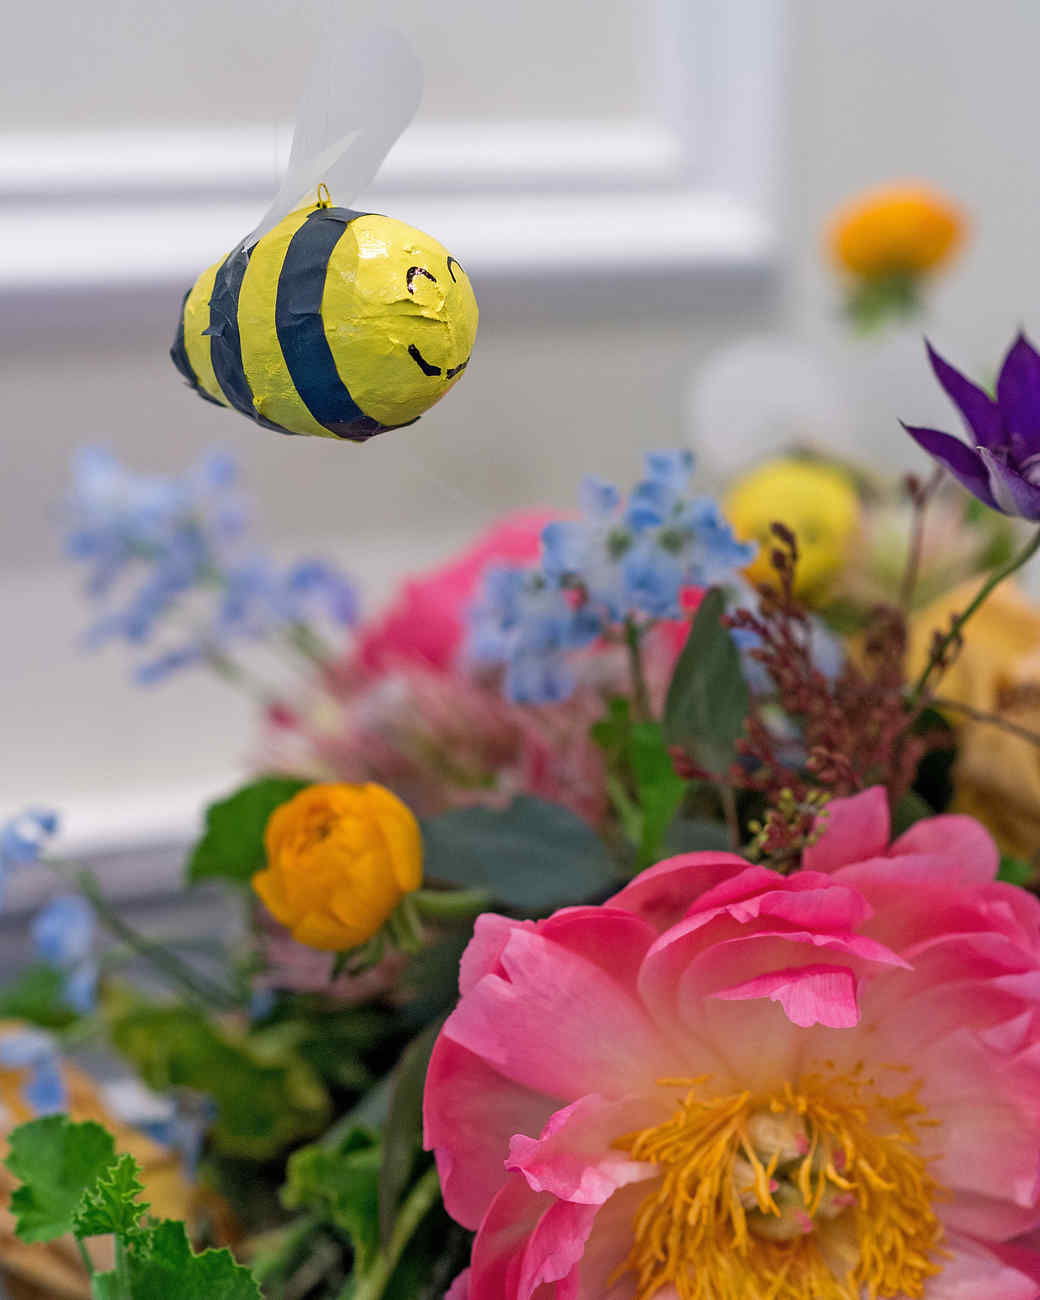 mangiolino bee and flower closeup